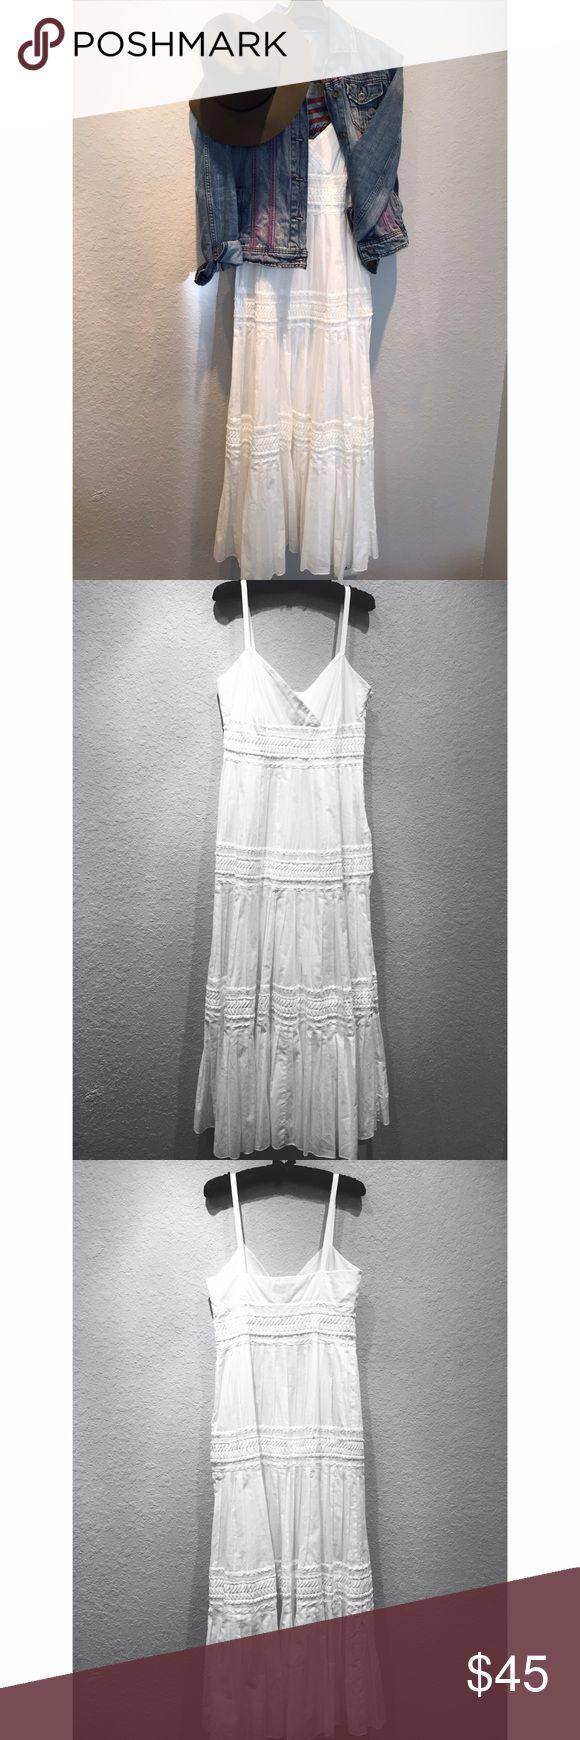 Ralph Lauren Cotton Maxi Dress Ralph Lauren White Cotton Maxi Dress with bohemian details. Ralph Lauren Dresses Maxi